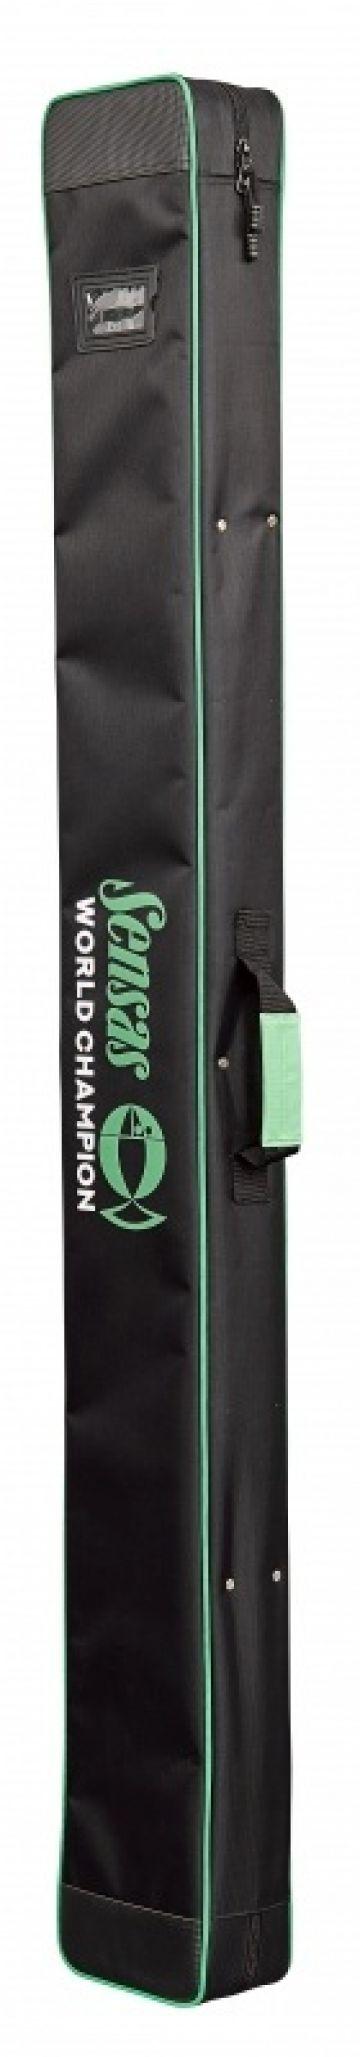 Sensas Classic Stijf Topsetkoffer zwart - groen visfoudraal 1m65